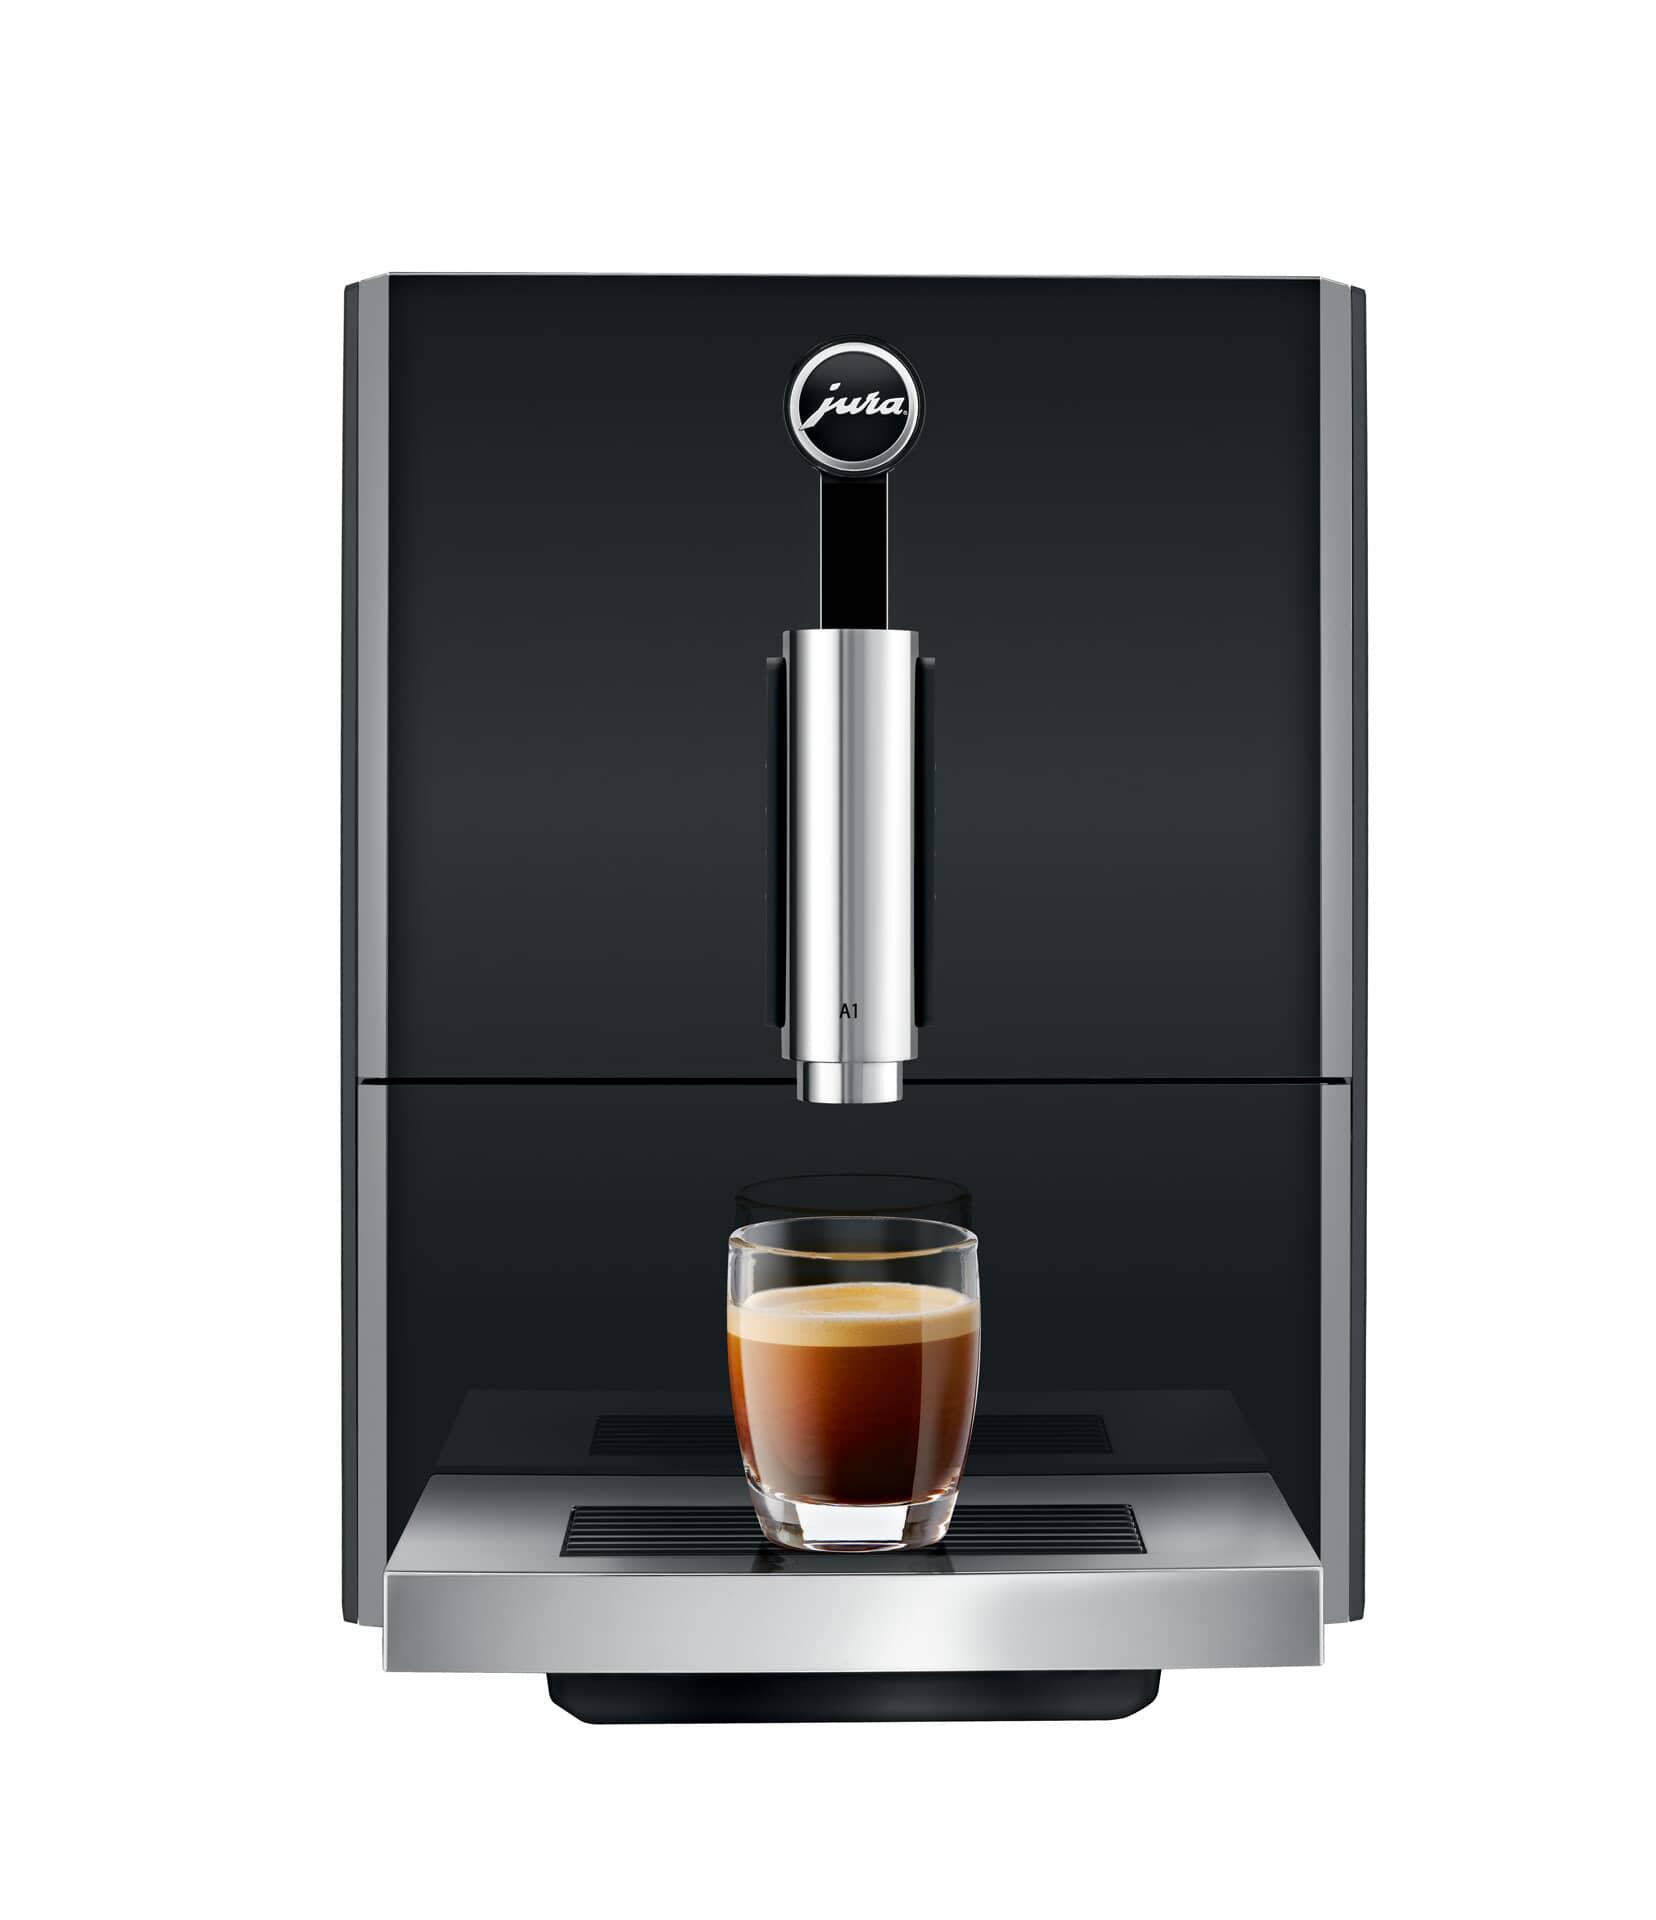 Jura A1 Coffee Machine Black